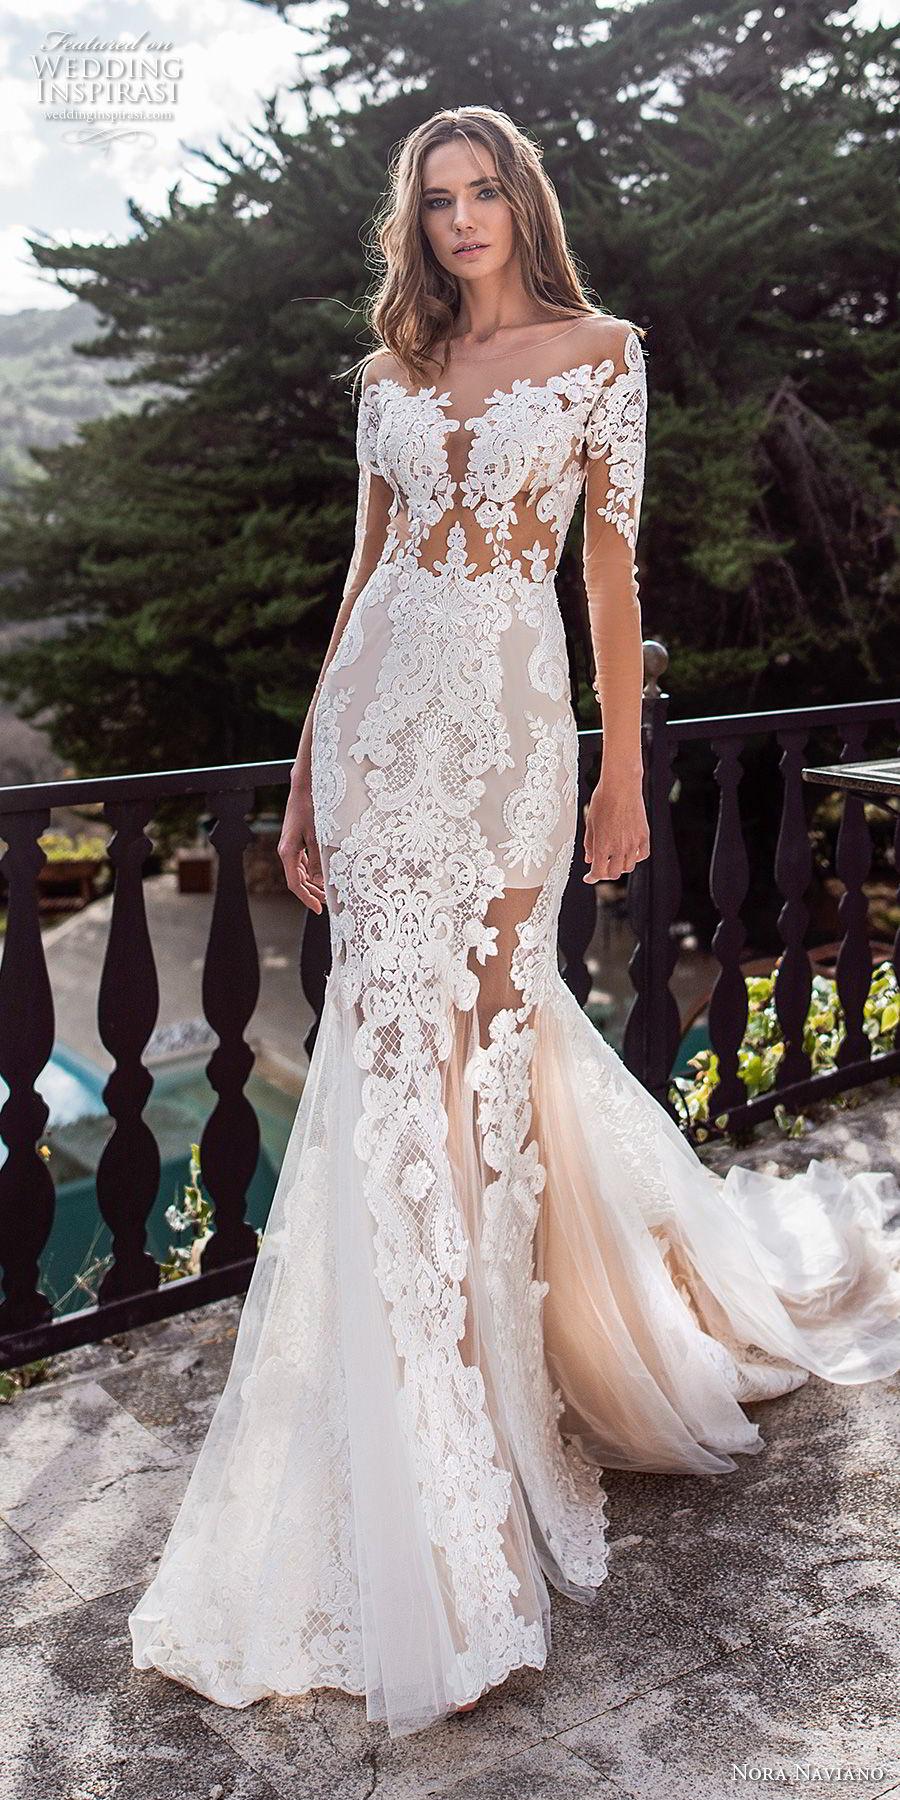 nora naviano 2019 bridal three quarter sleeves illusion bateau v neck full embellishment elegant fit and flare wedding dress sheer button back chapel train (10) lv